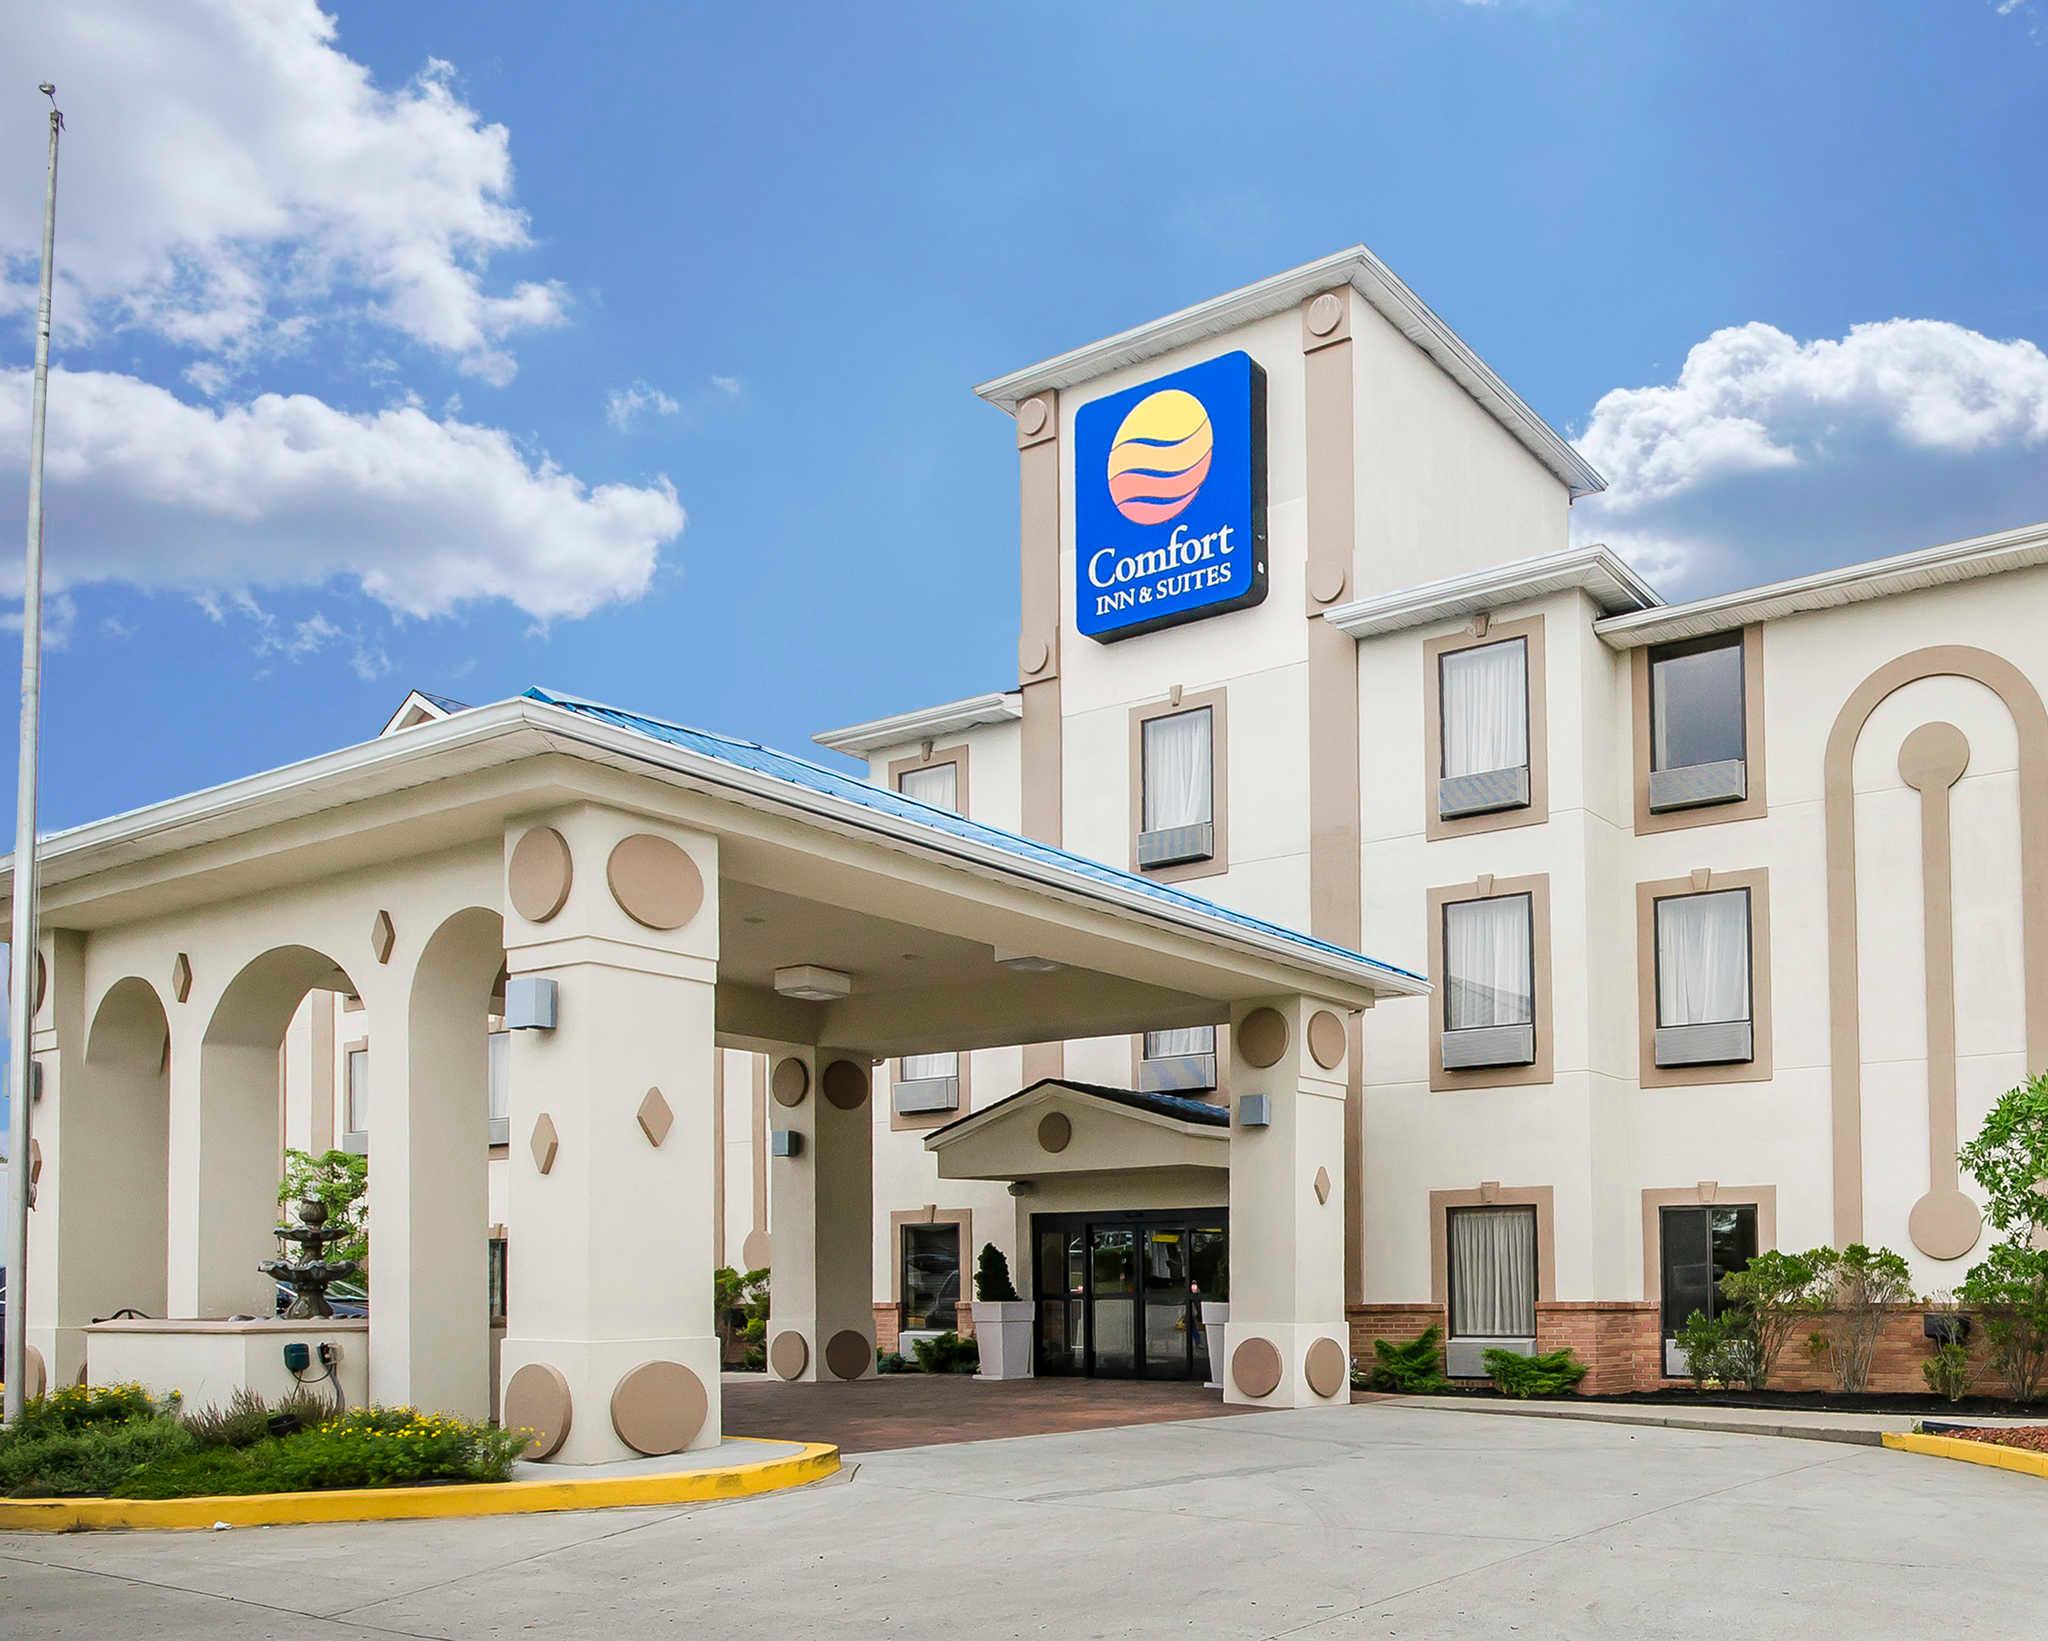 Comfort Inn Amp Suites In La Grange Ky 502 222 5